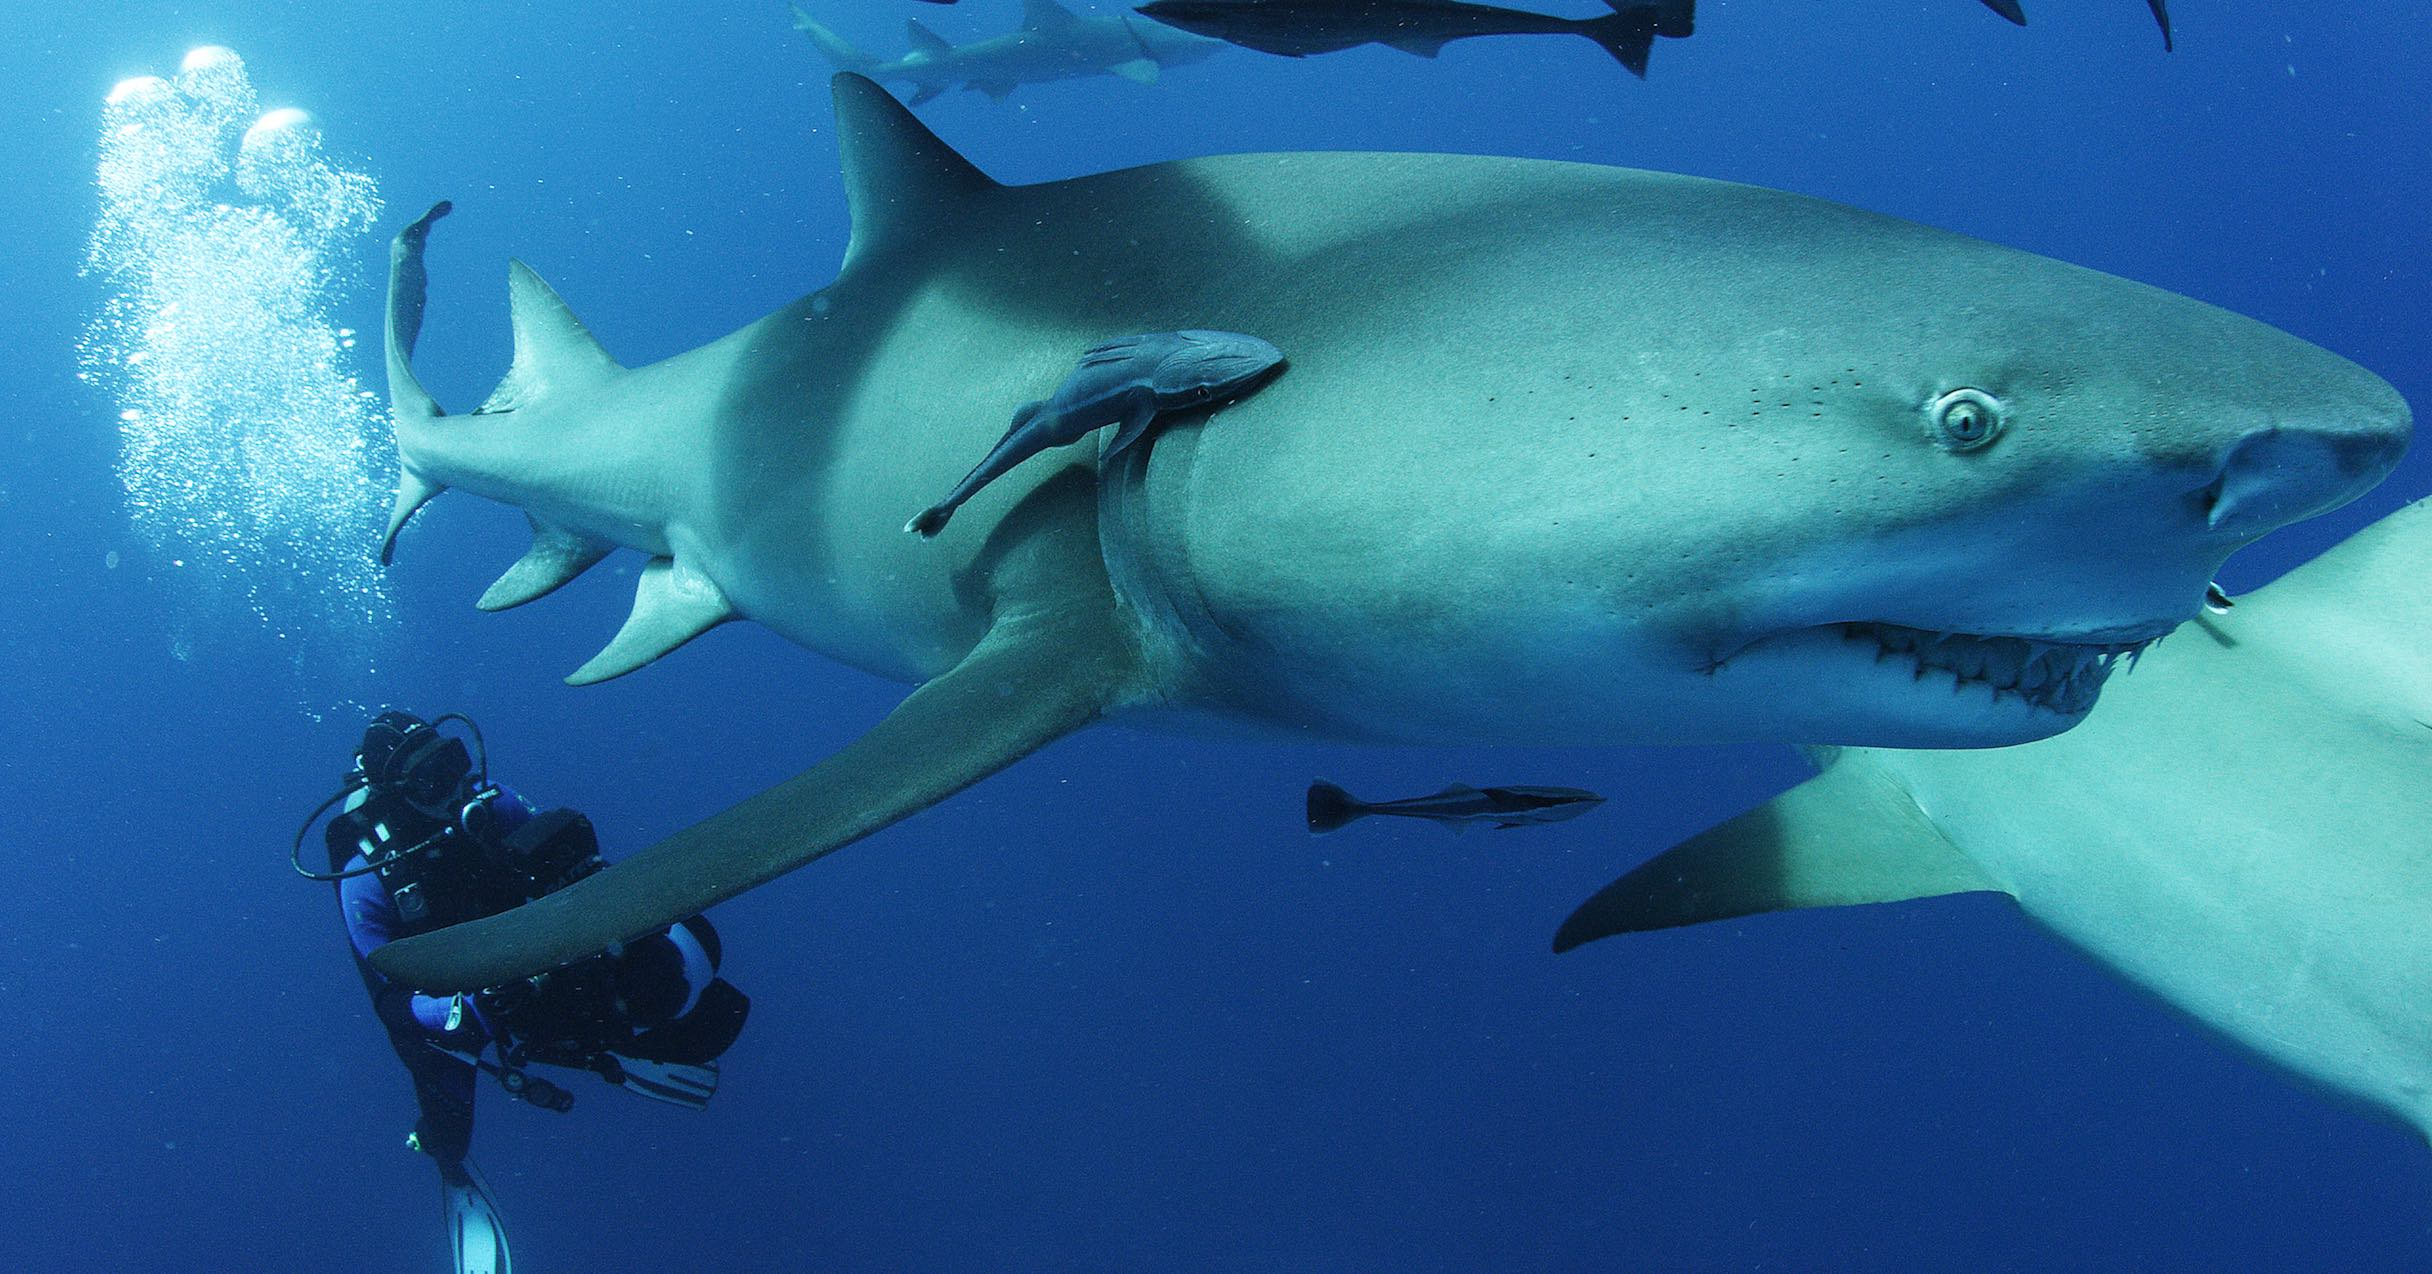 sharkwater extinction shark great white